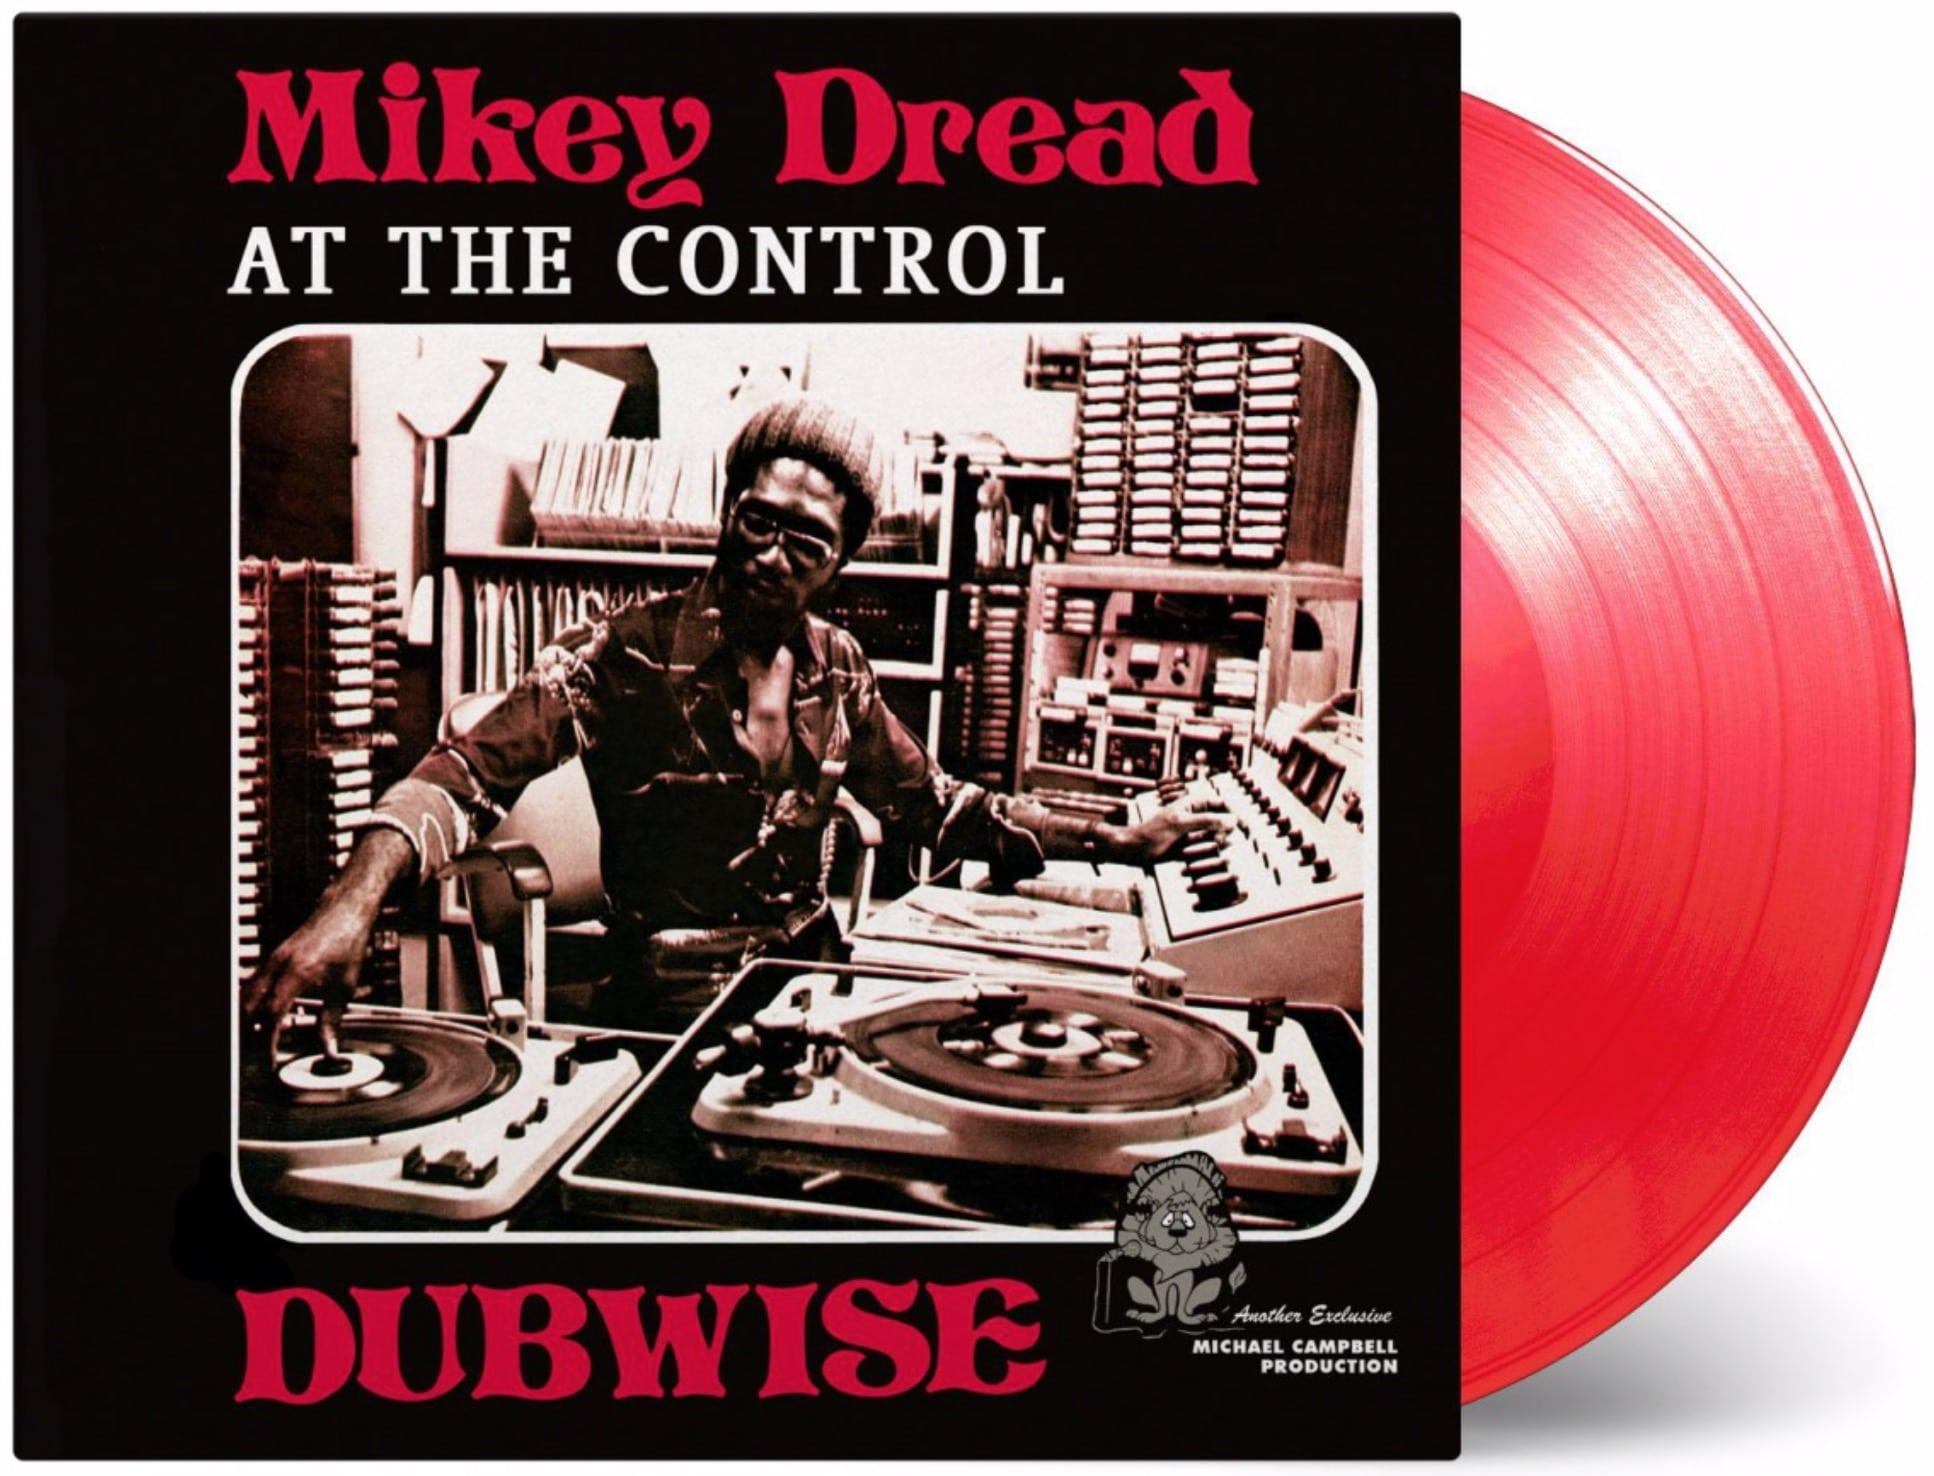 Mikey Dread: Down & Dubwise